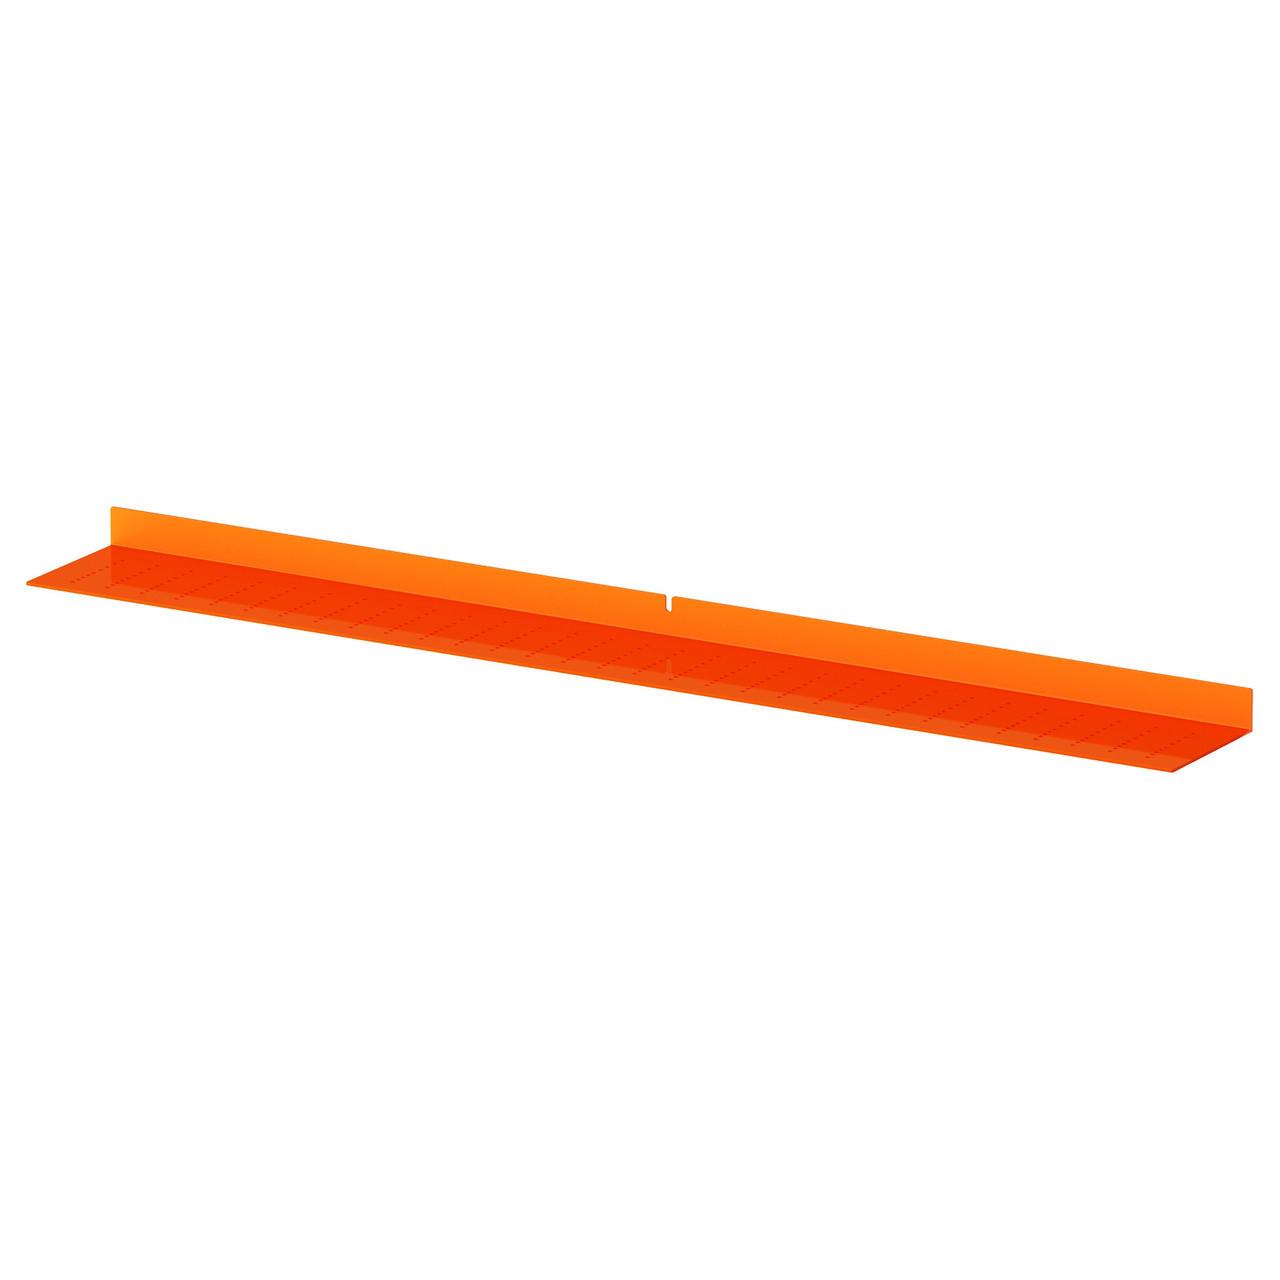 FIXA Шаблон для сверла, оранжевый 903.233.93